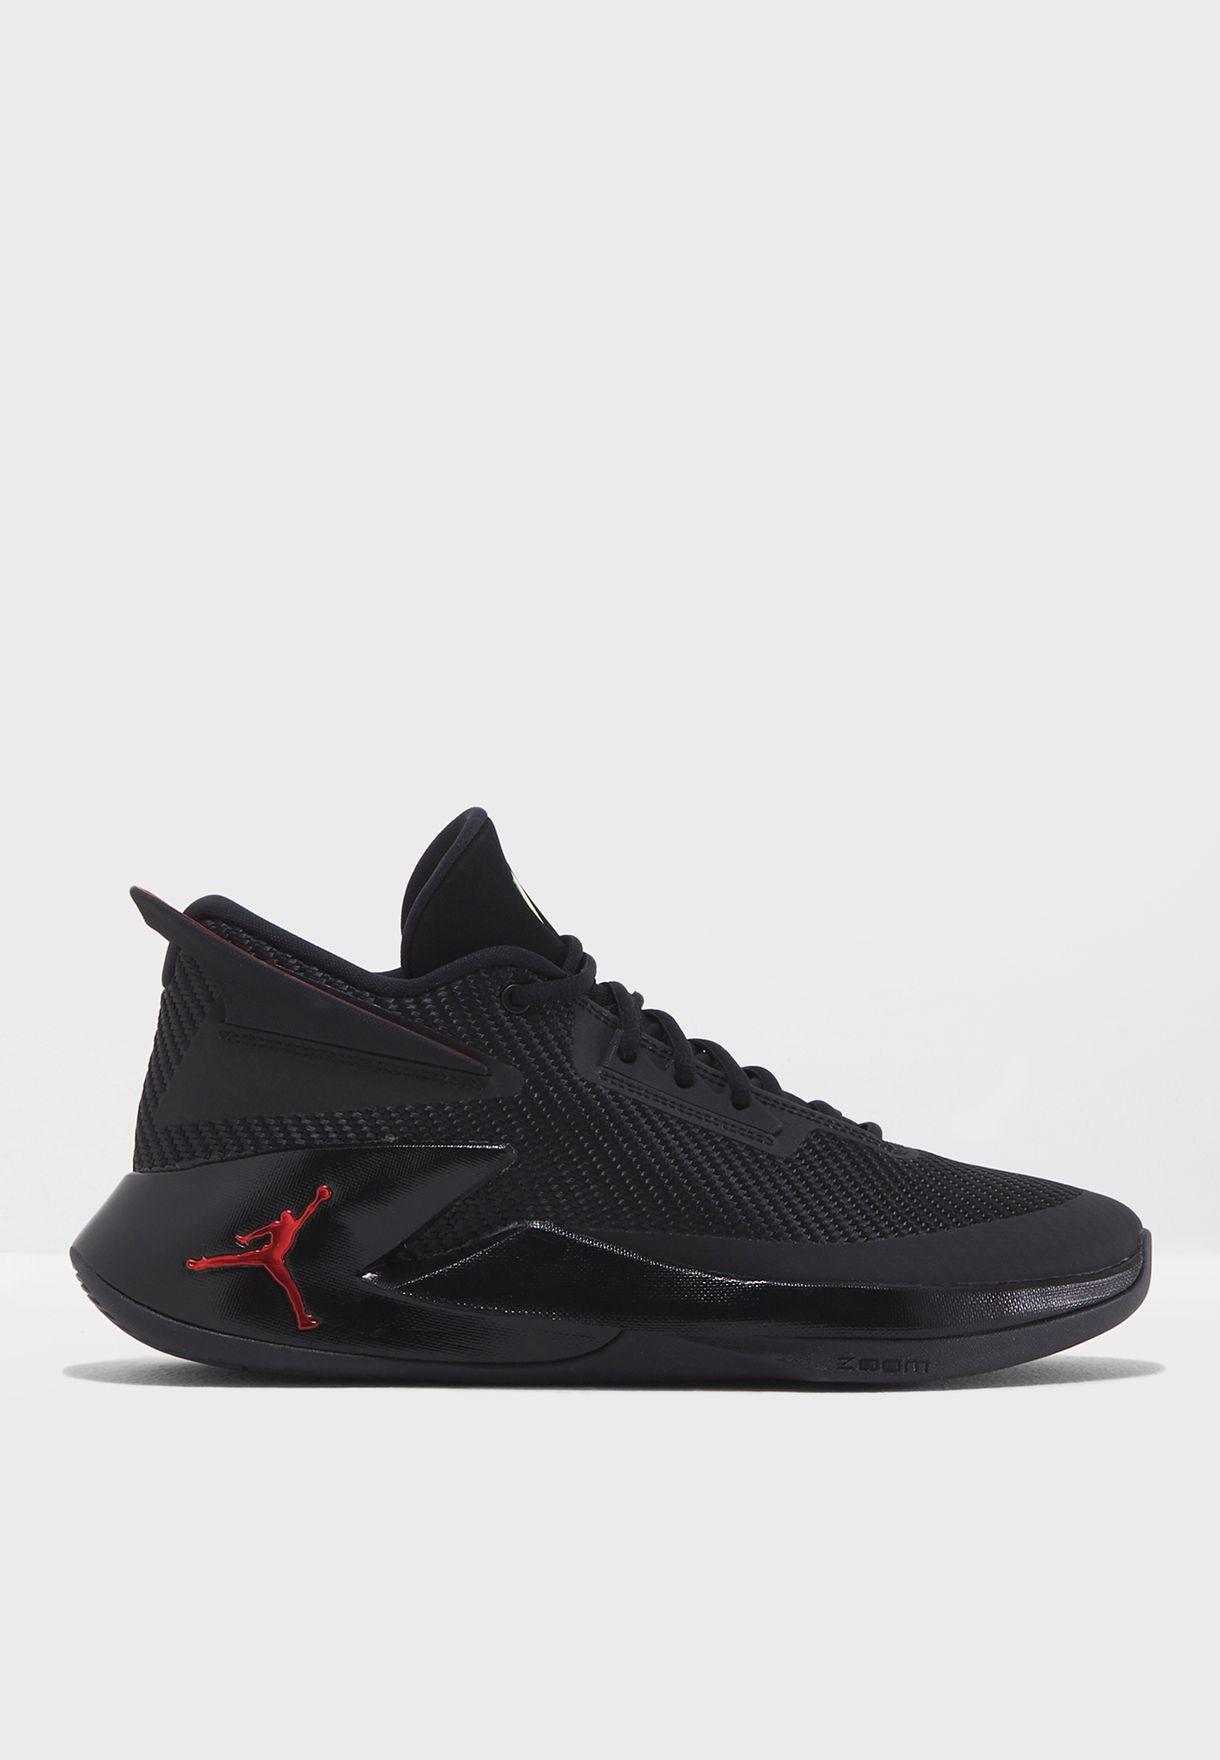 470925653ef53 Shop Nike black Jordan Fly Lockdown AJ9499-012 for Men in UAE ...